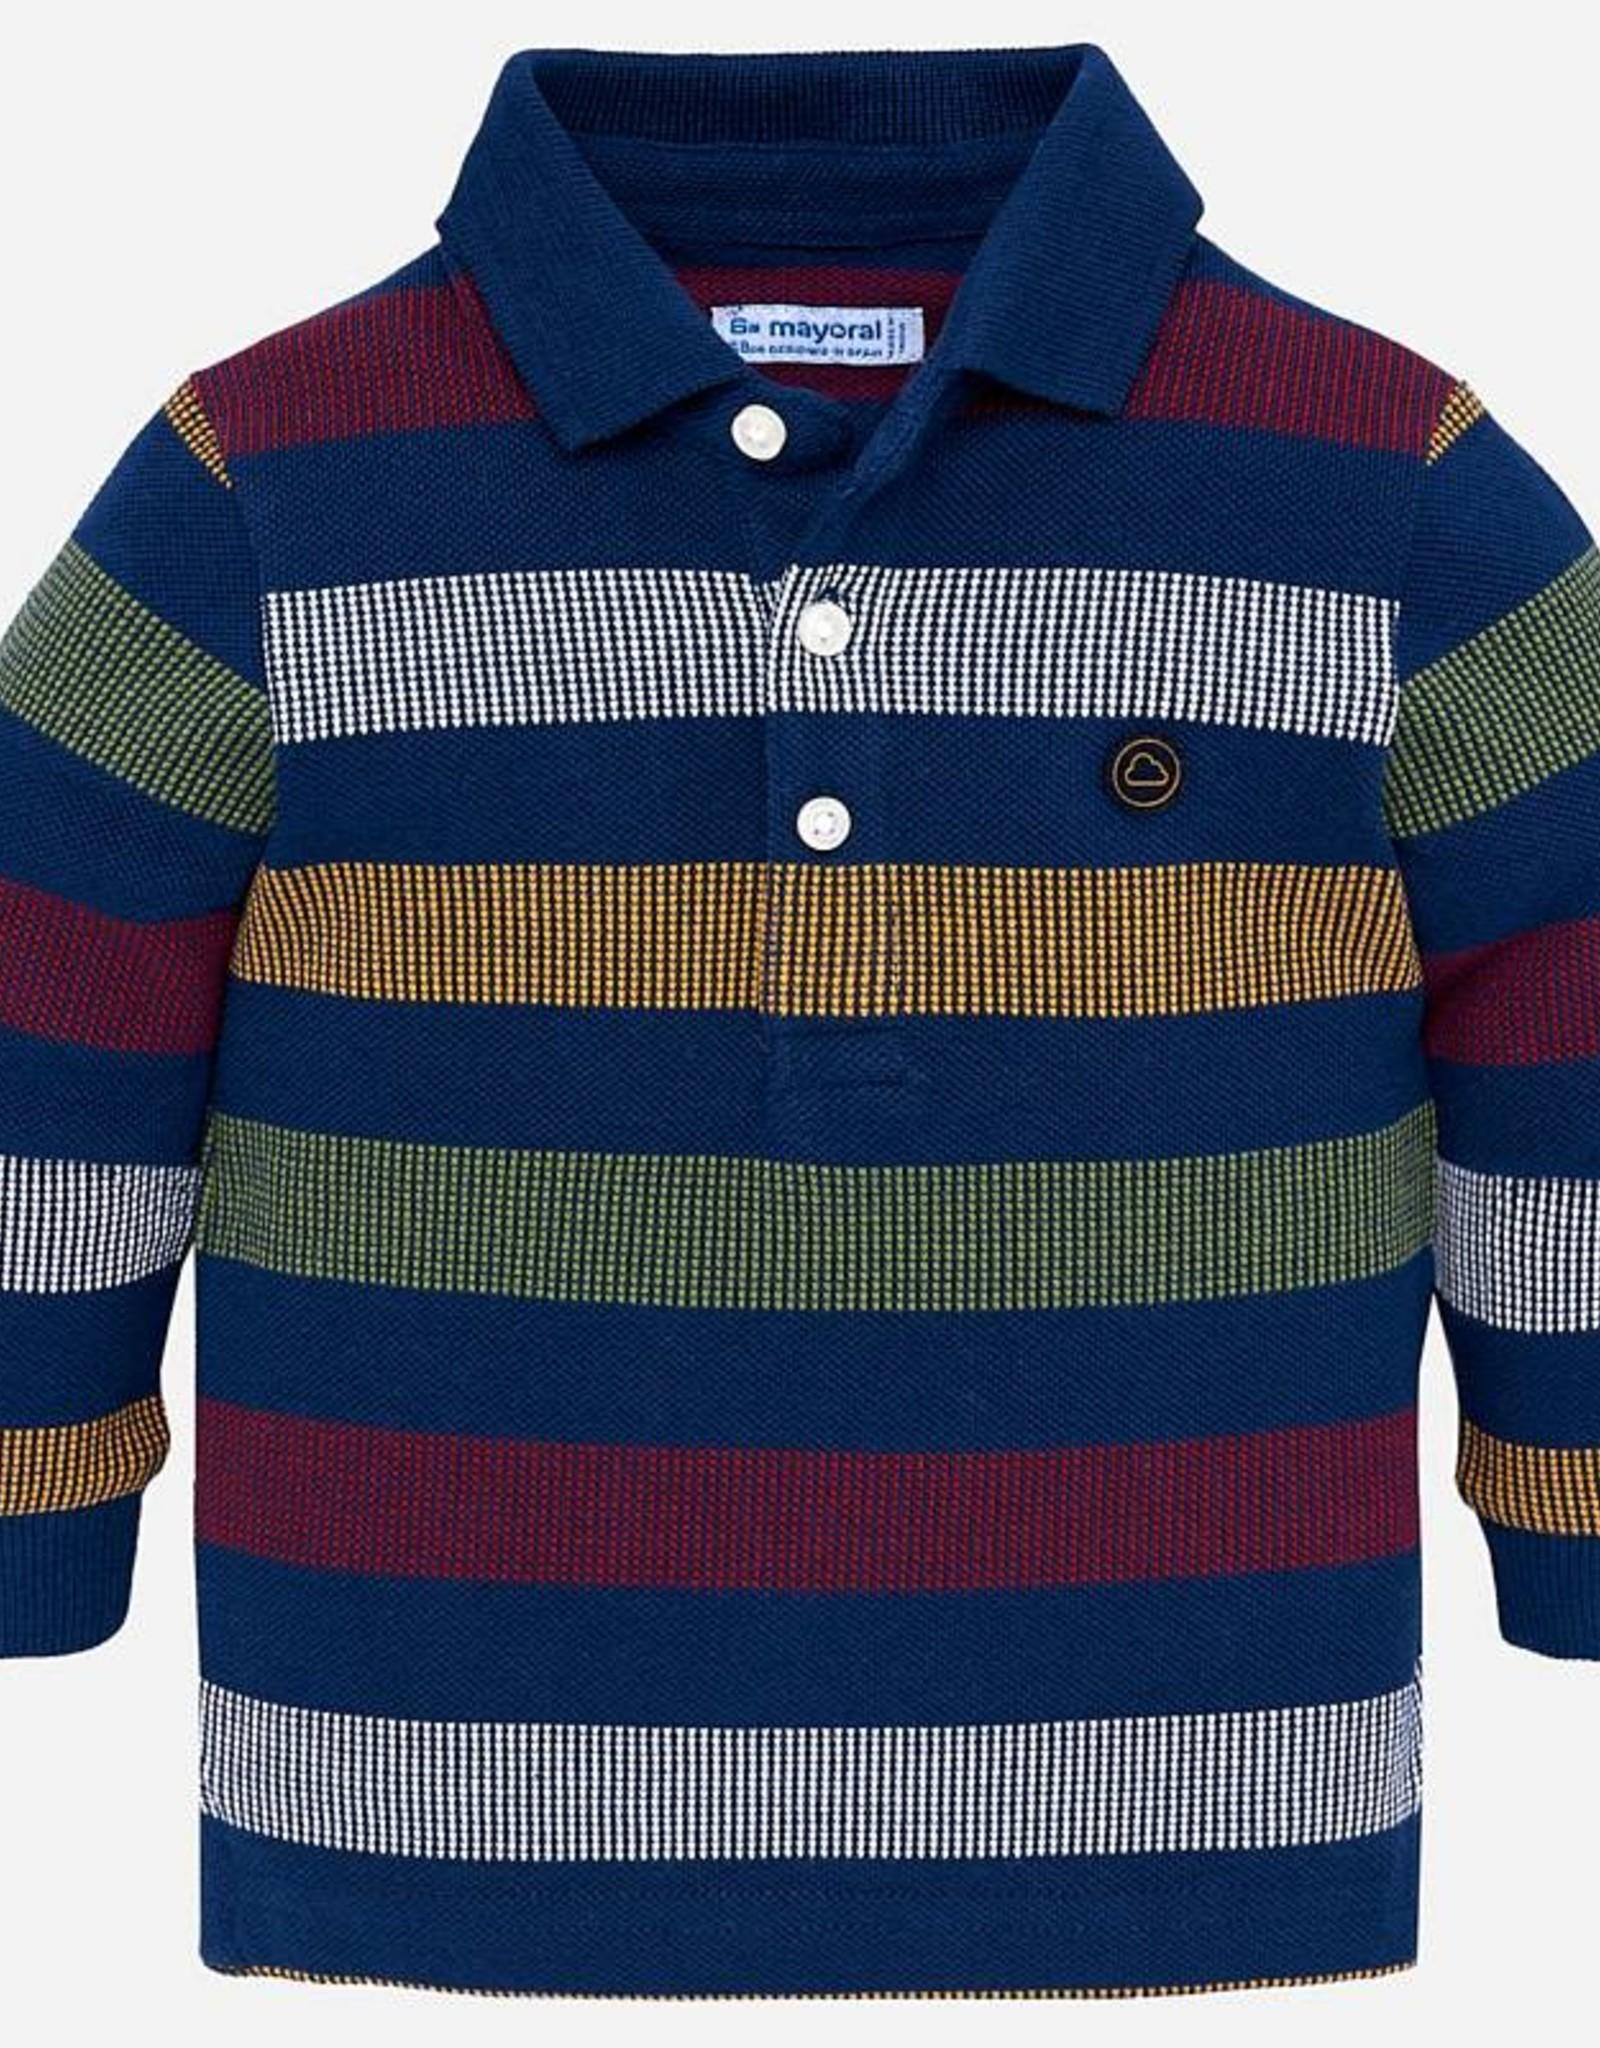 Mayoral Long Sleeve Striped Polo Shirt